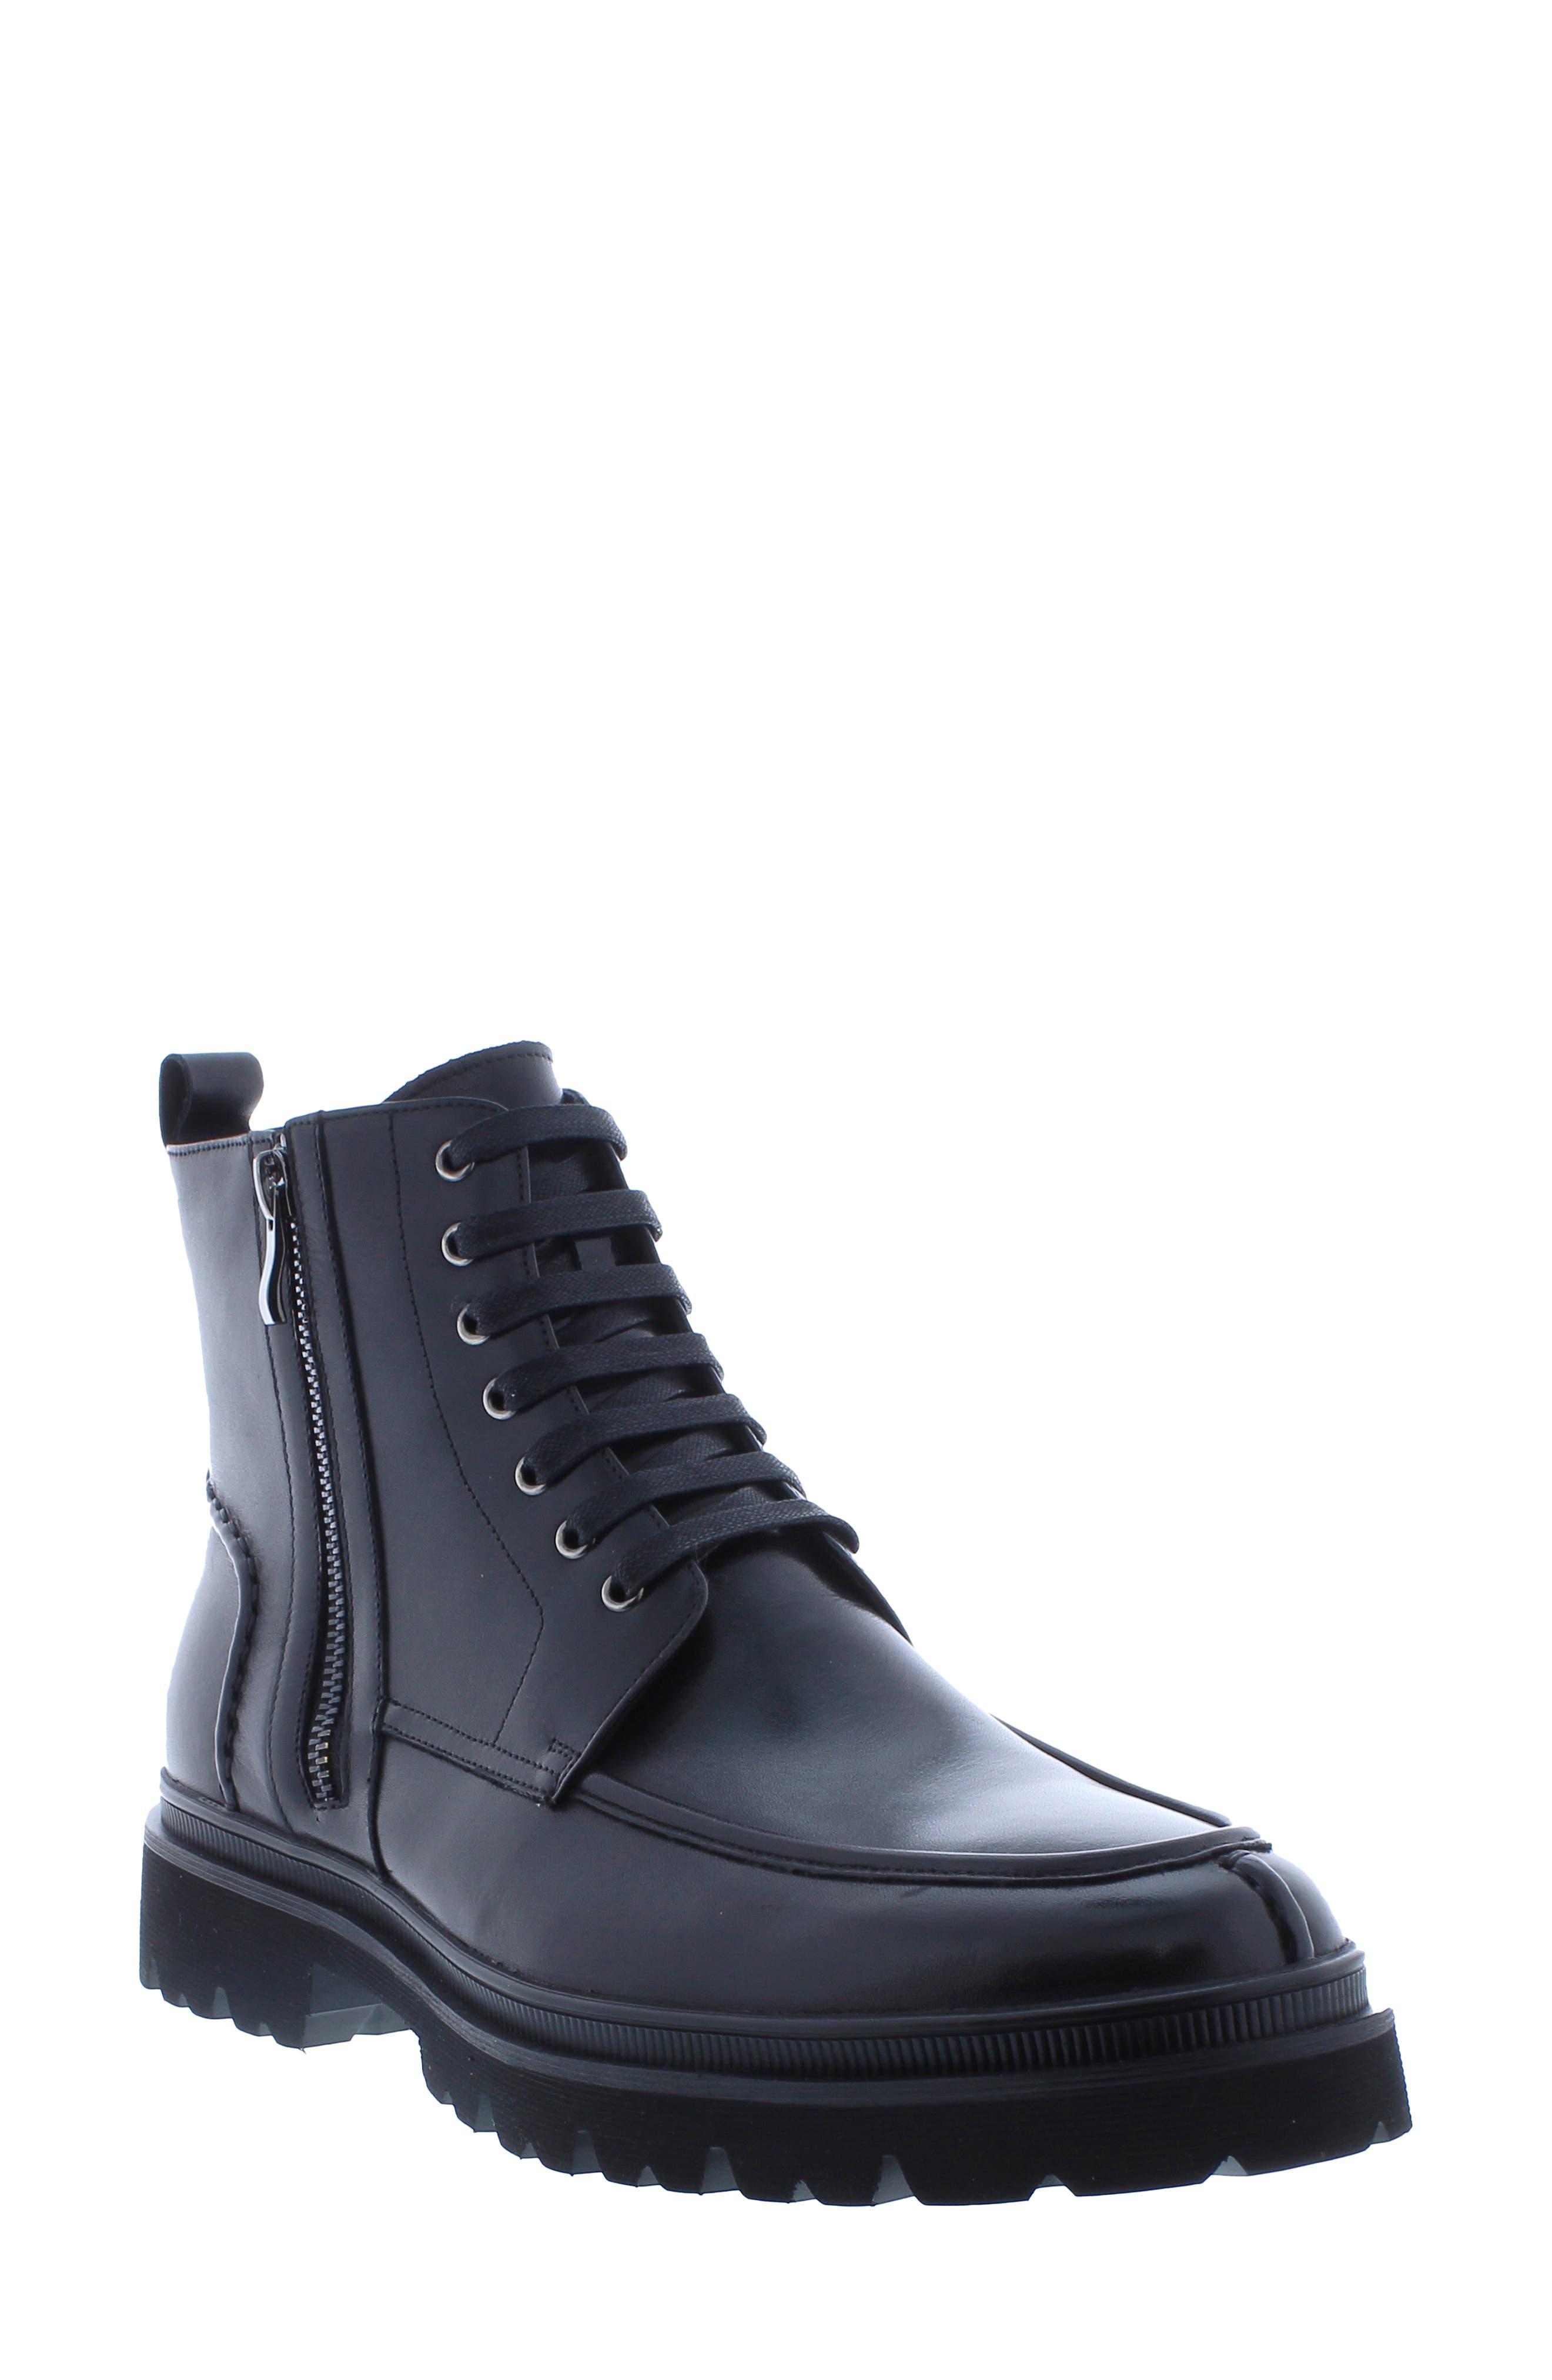 Men's Zanzara Shoes | Nordstrom